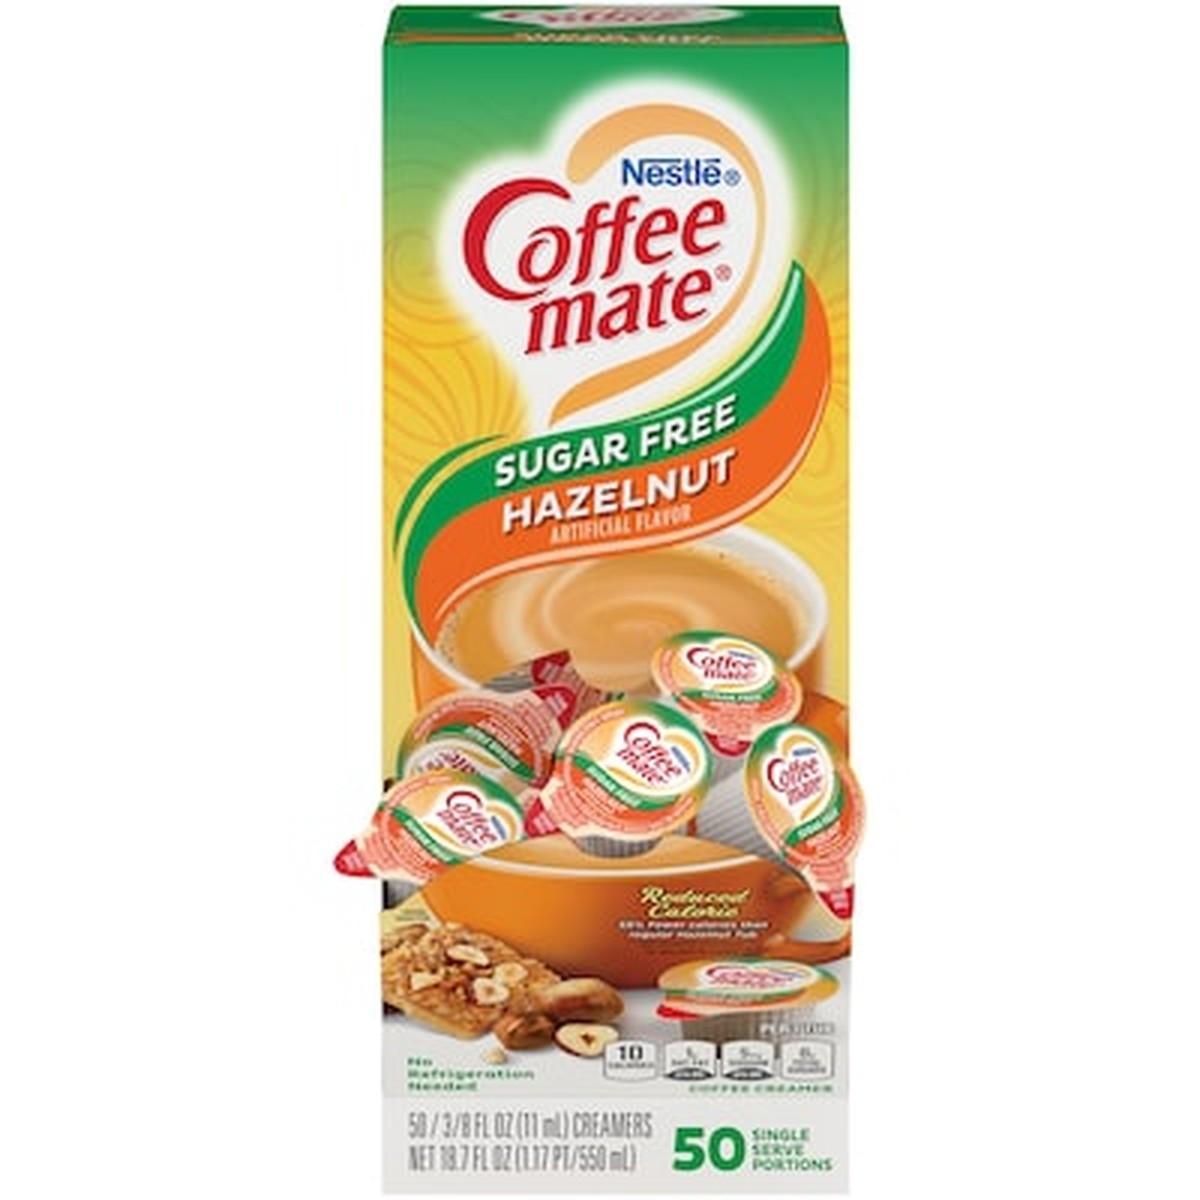 Liquid Coffee Creamer, Sugar-Free Hazelnut, 0.38 oz Mini Cups, 50/Box